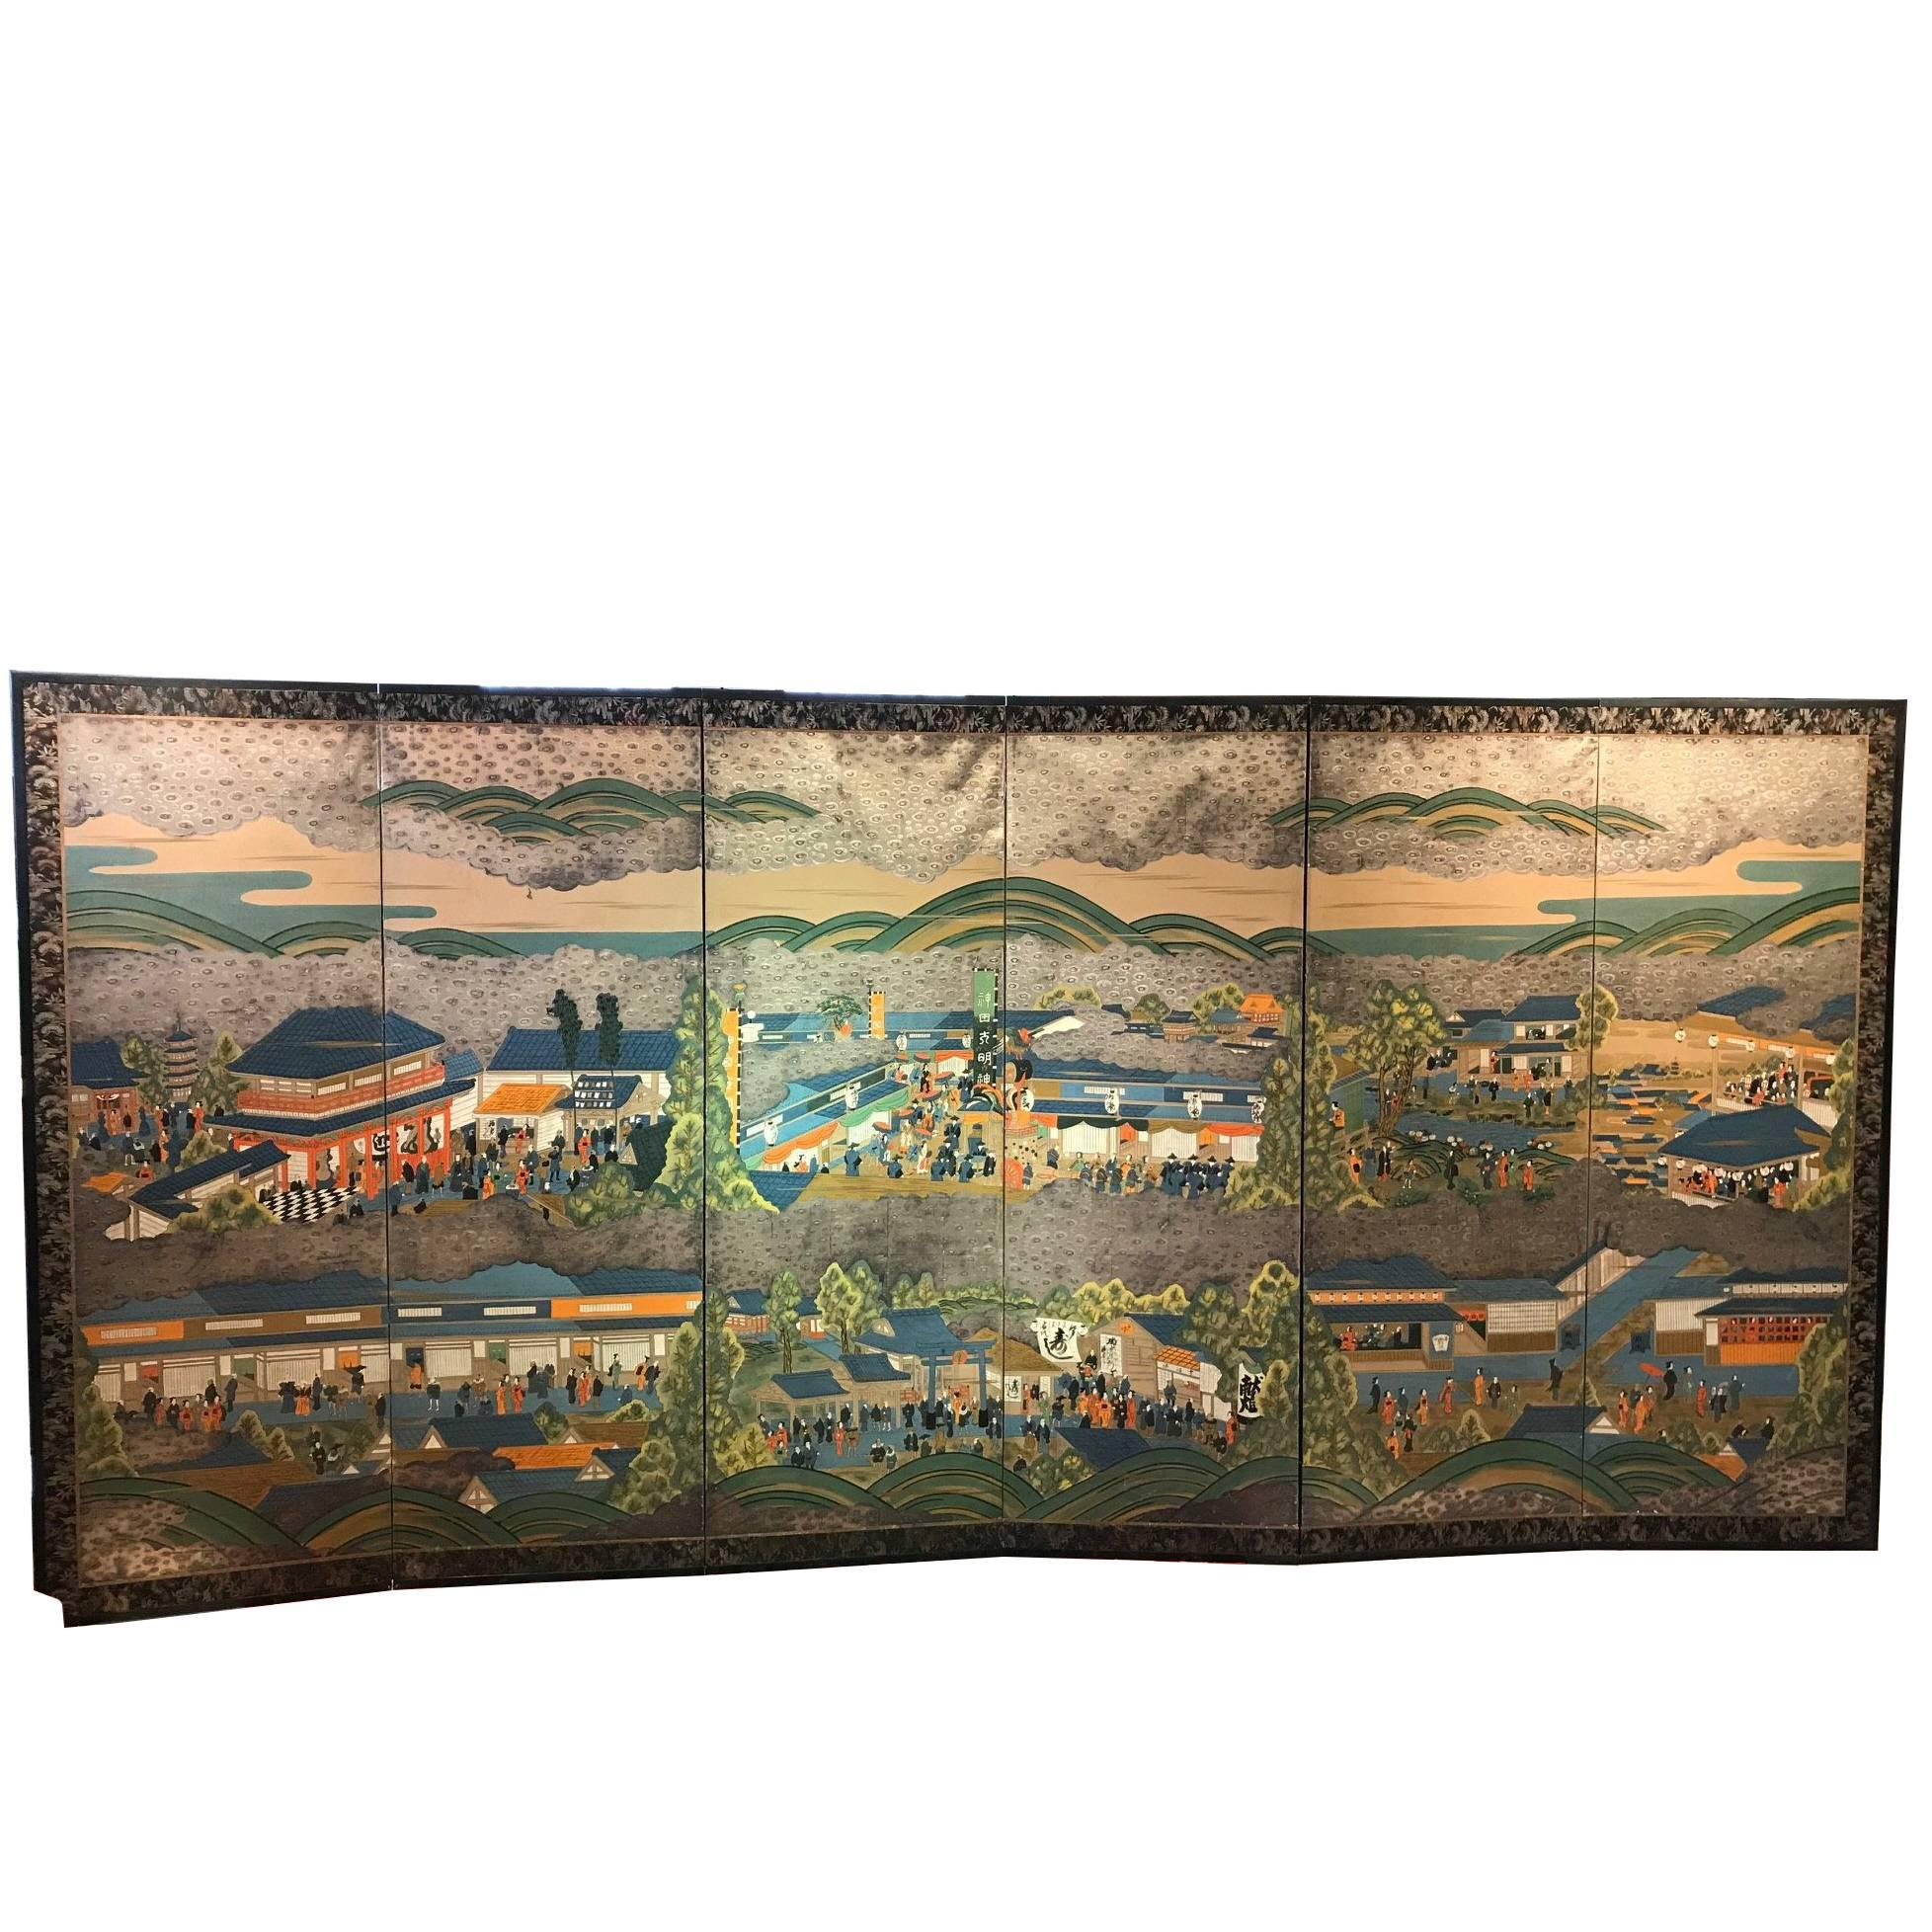 Japan Brilliant Six-Panel Screen Nara Matsuri Summer Festival Ink and Gold